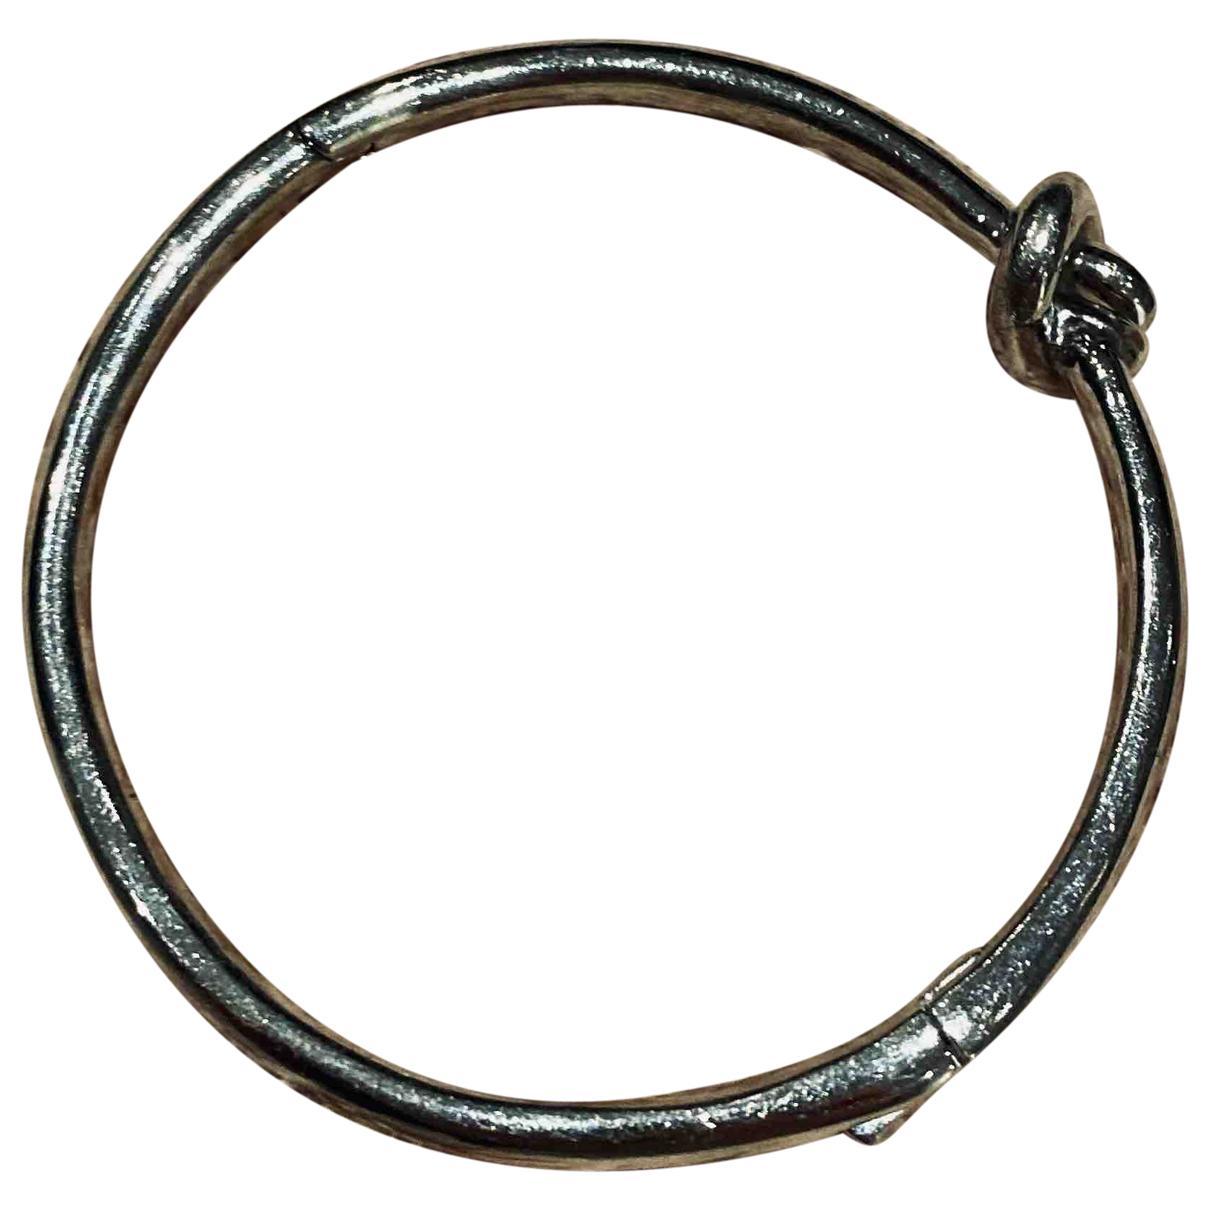 Kate Spade - Bracelet   pour femme en metal - argente